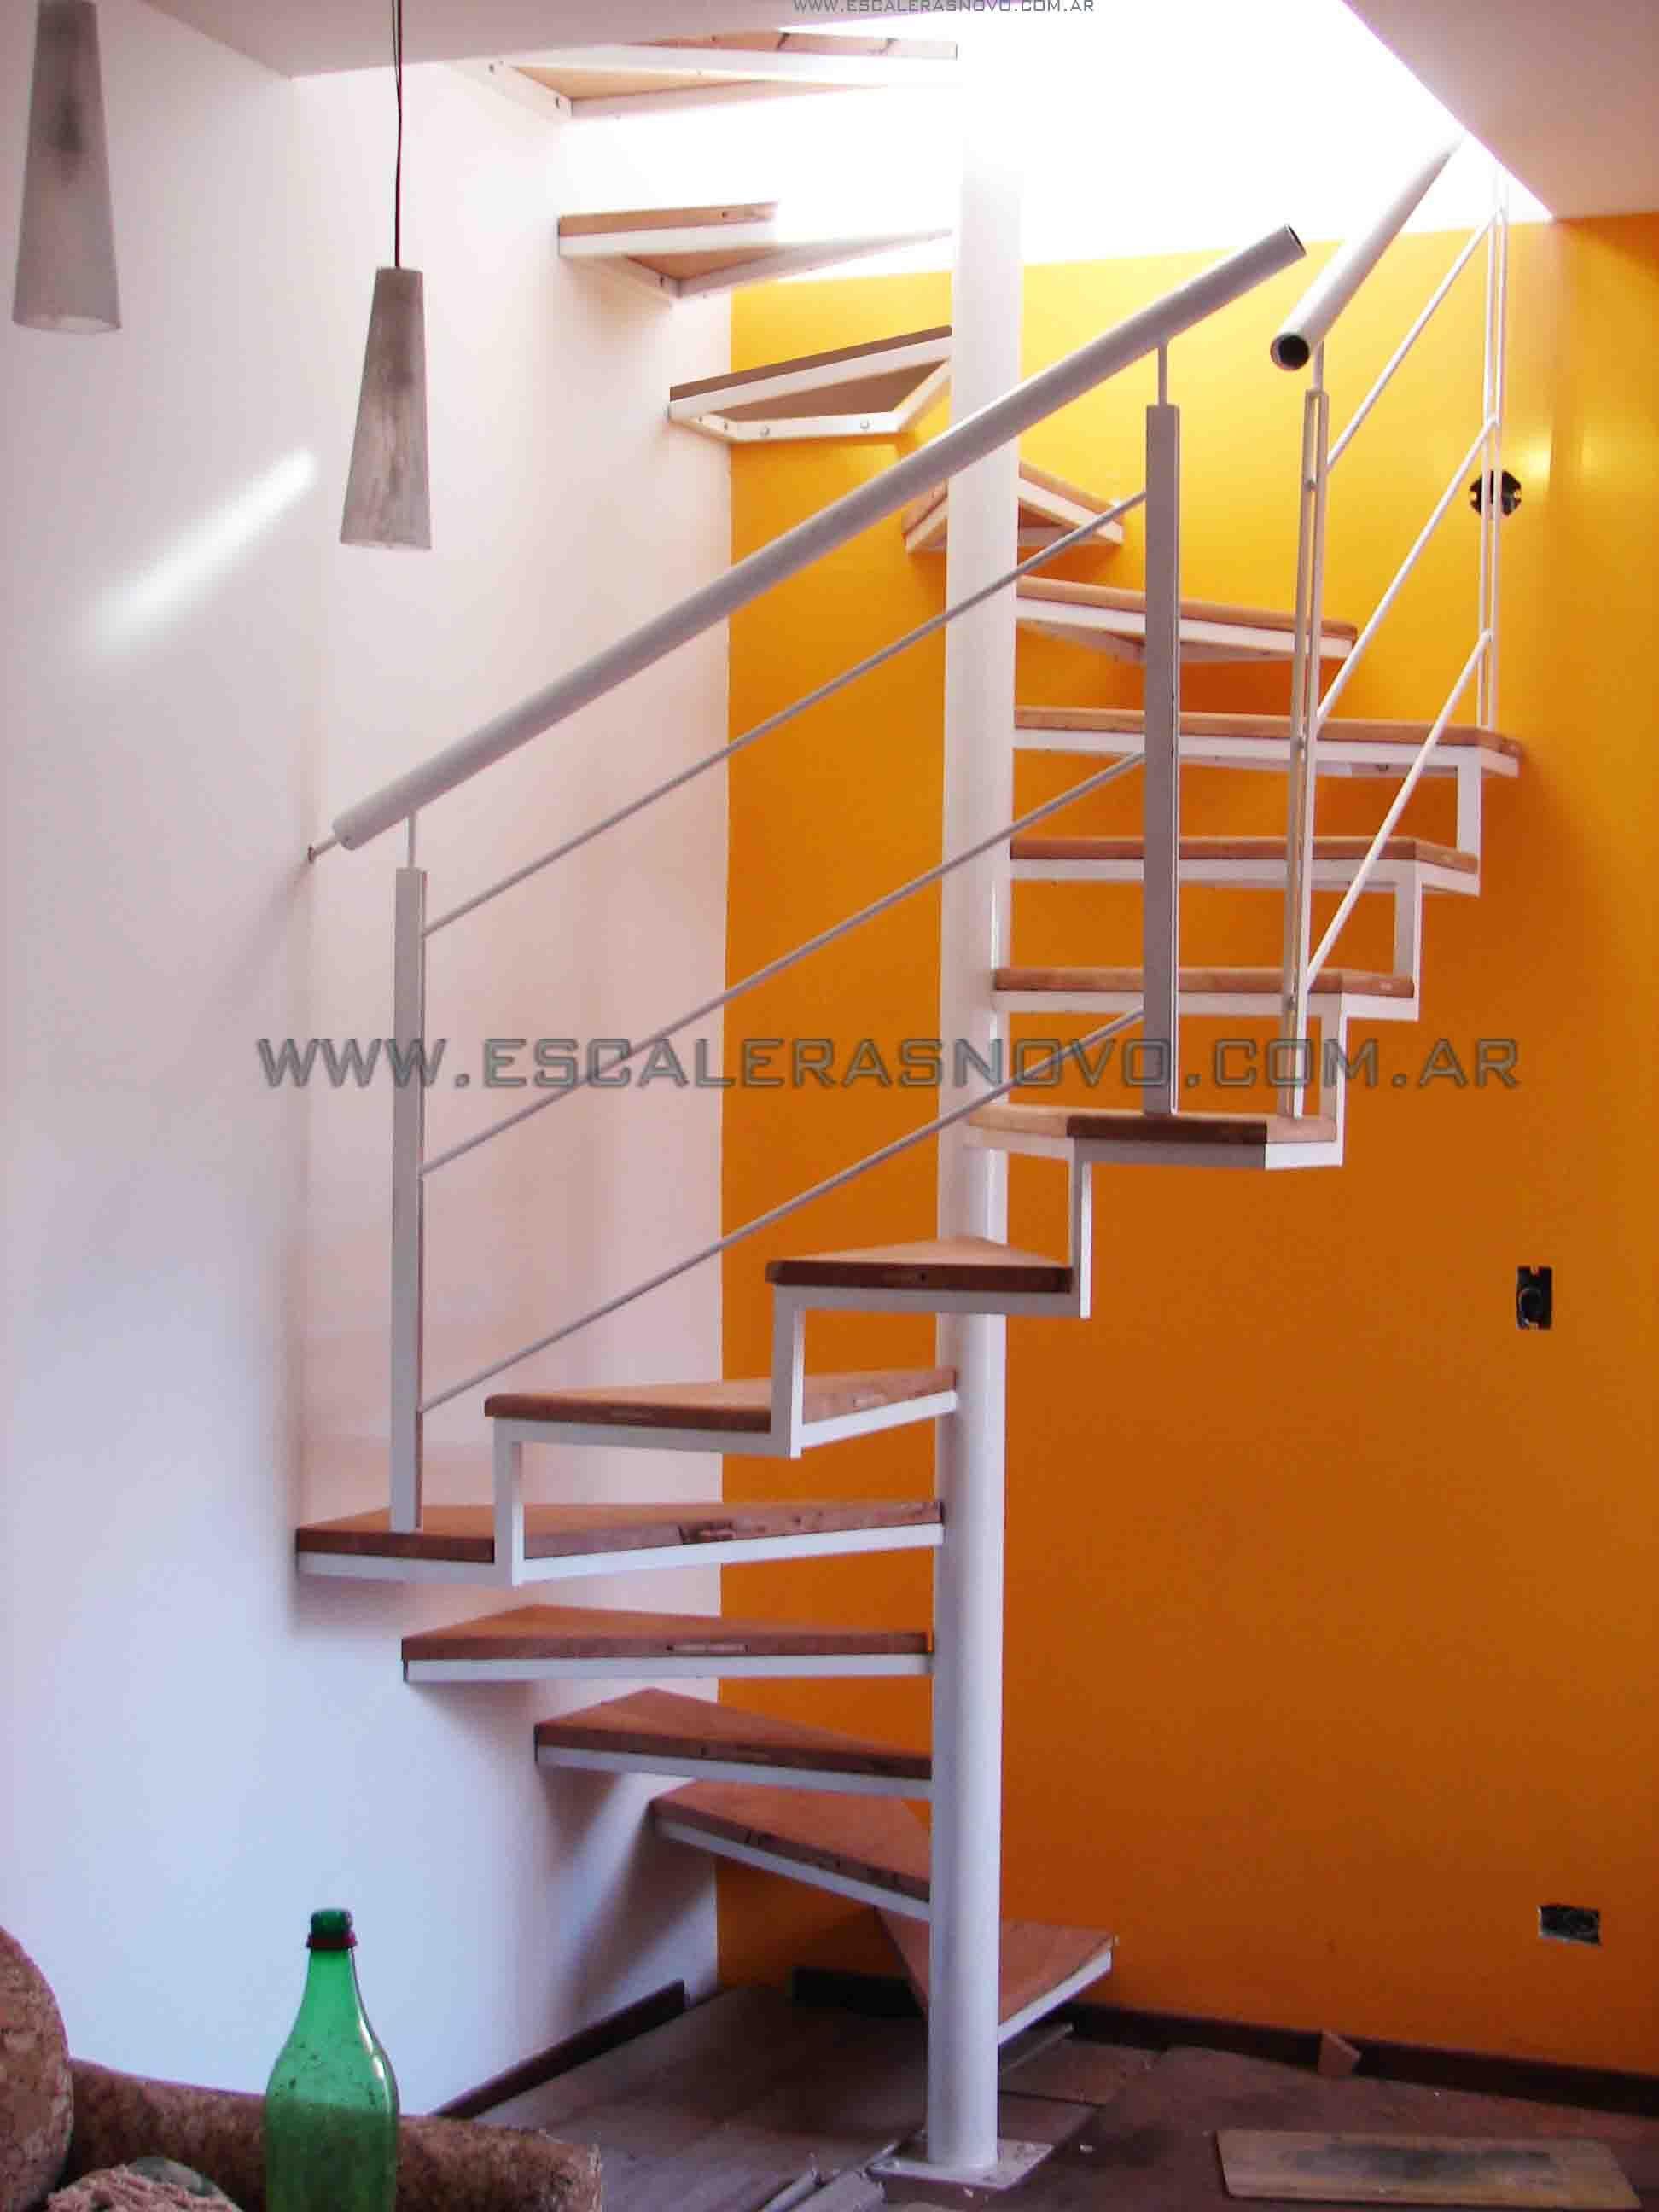 Escaleras de caracol interiores escaleras de caracol con for Gradas metalicas para interiores